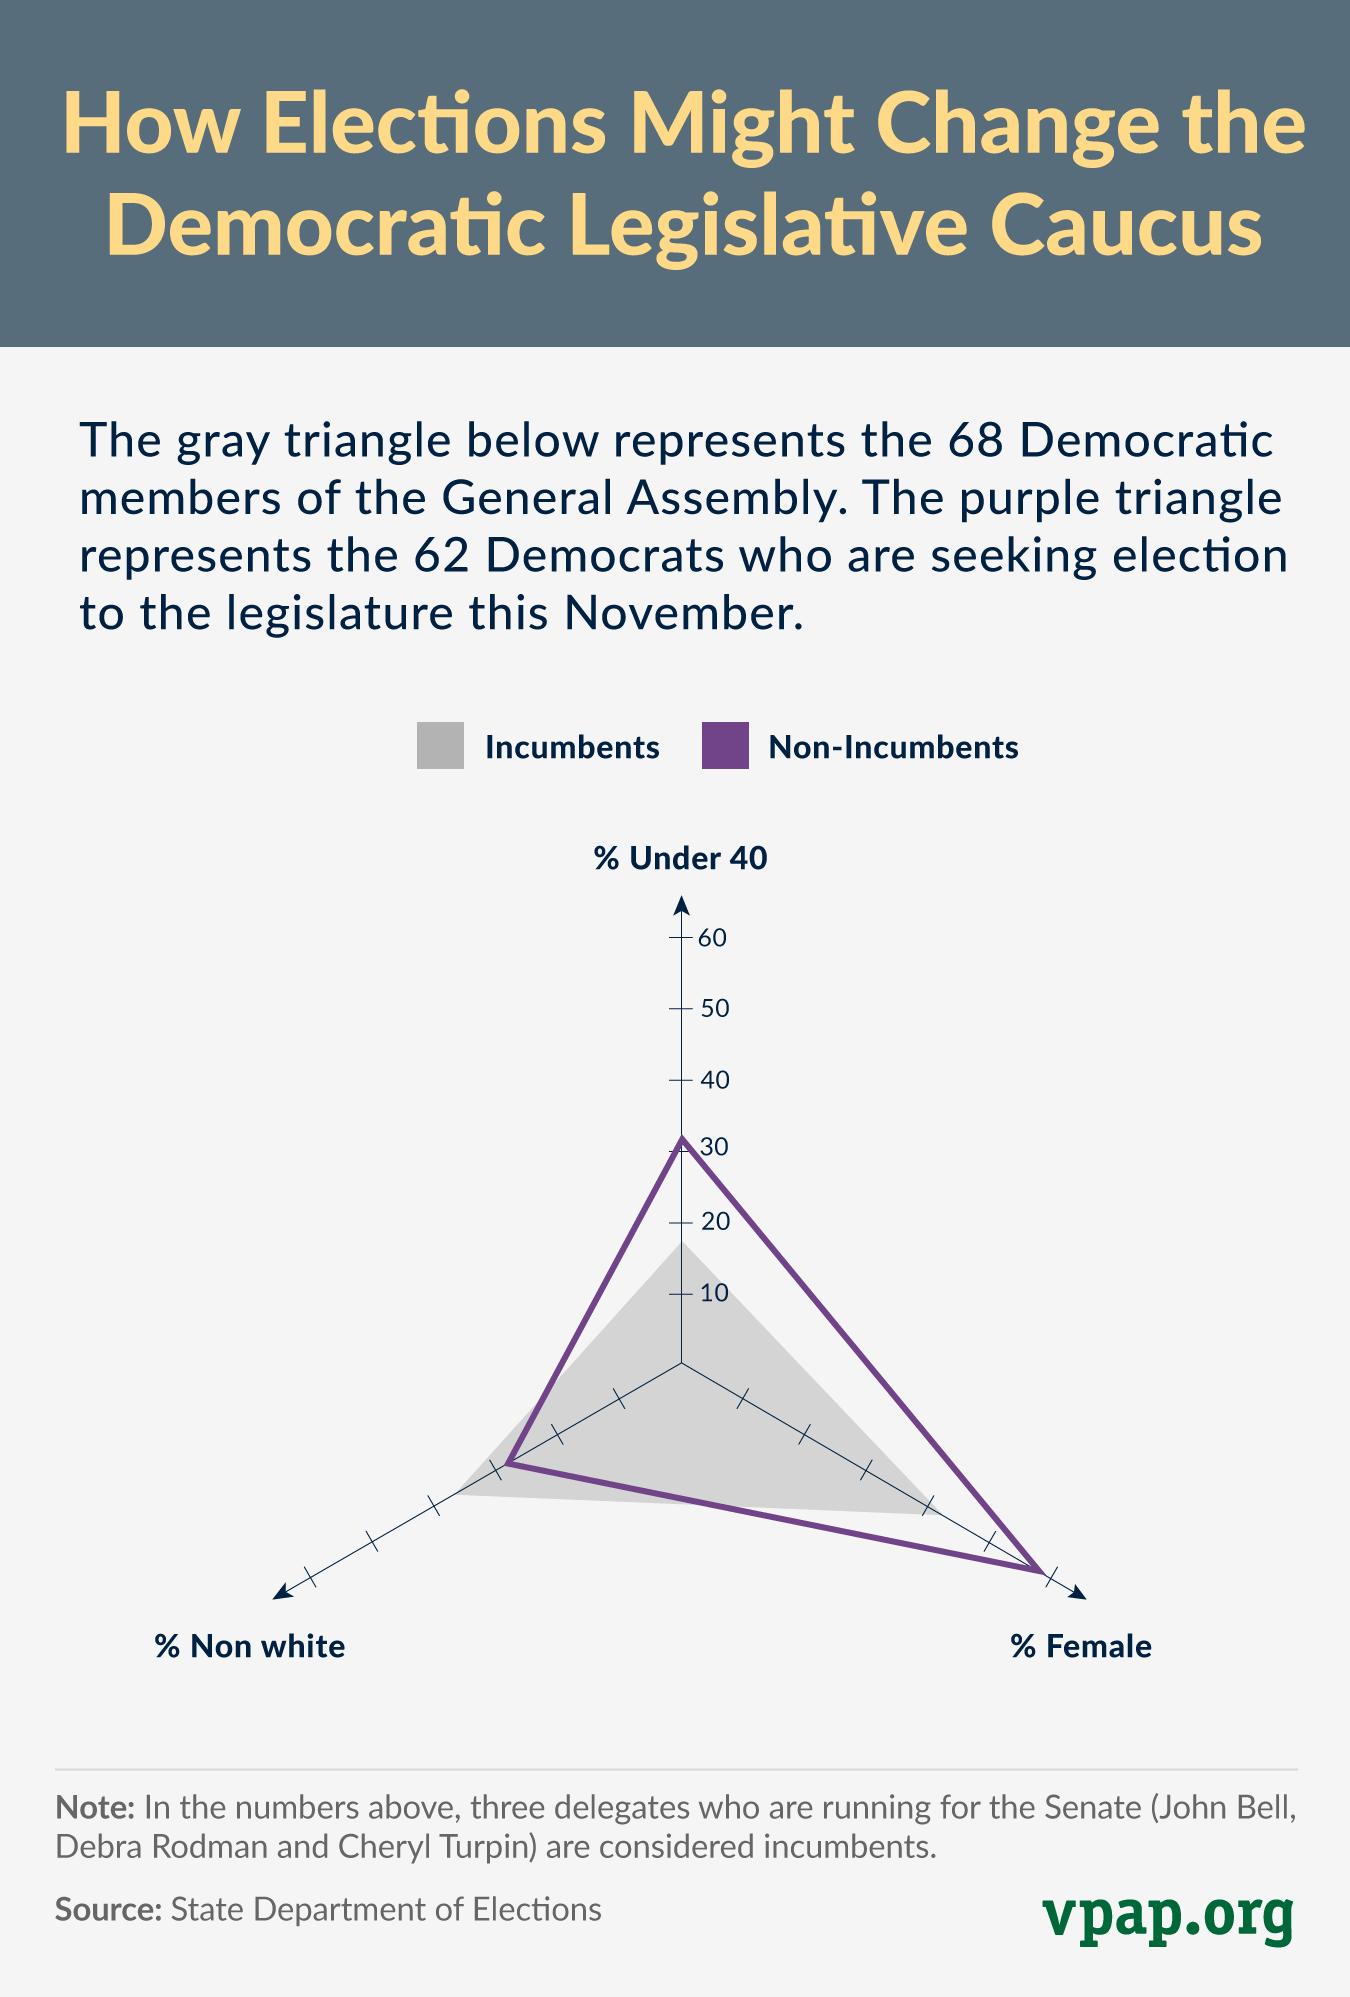 How Elections Might Change the Democratic Legislative Caucus